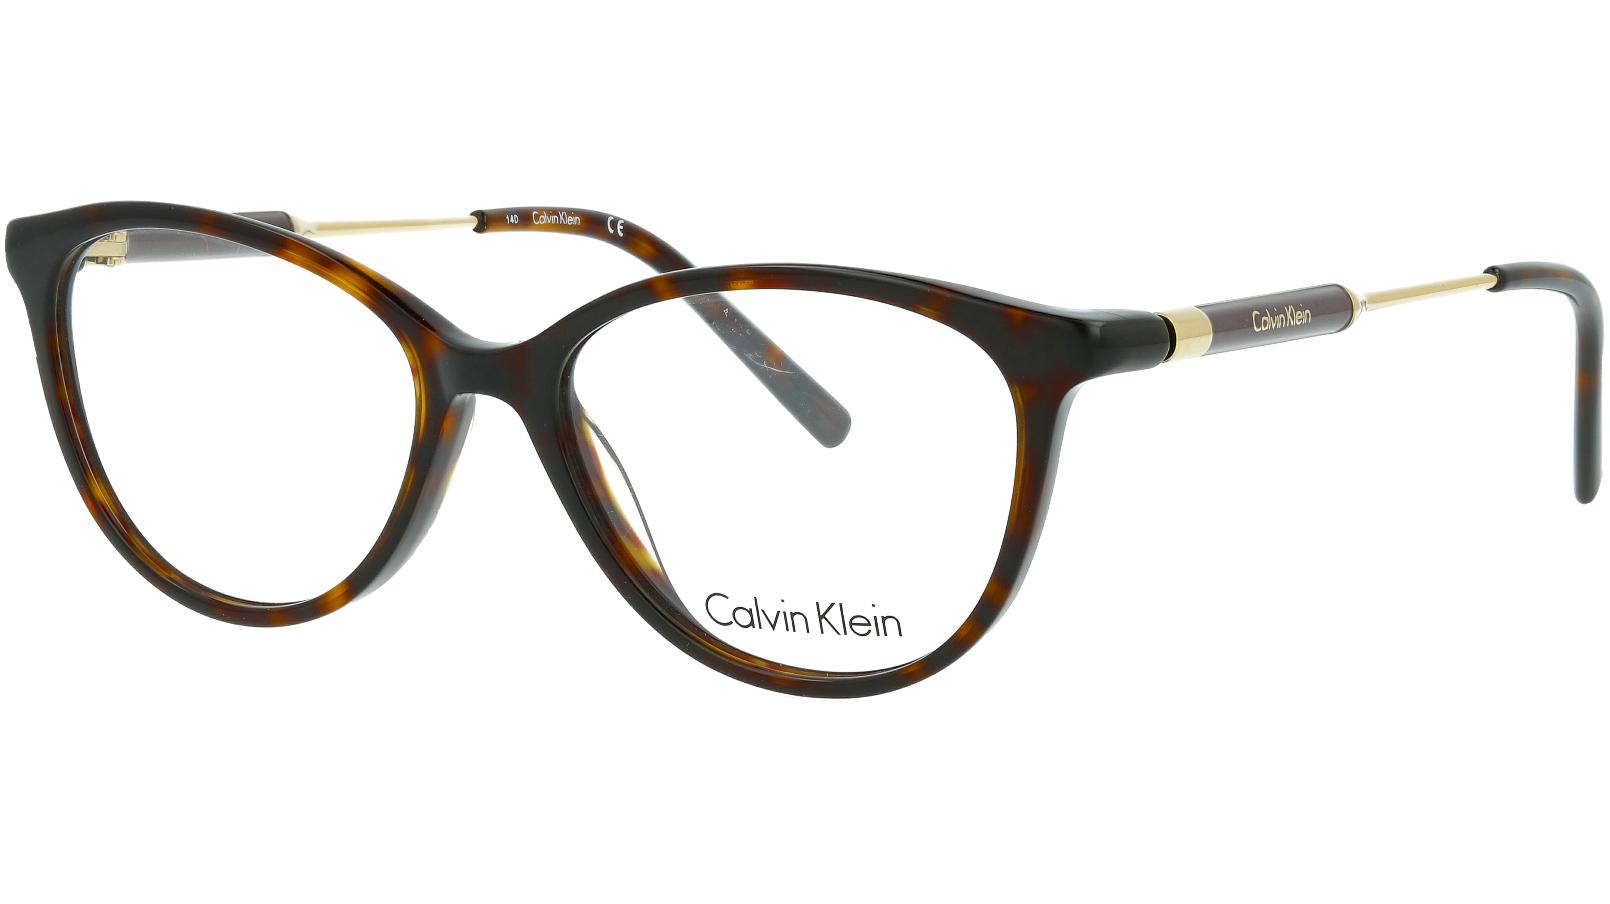 Calvin Klein CK5986 234 52 Havana Glasses